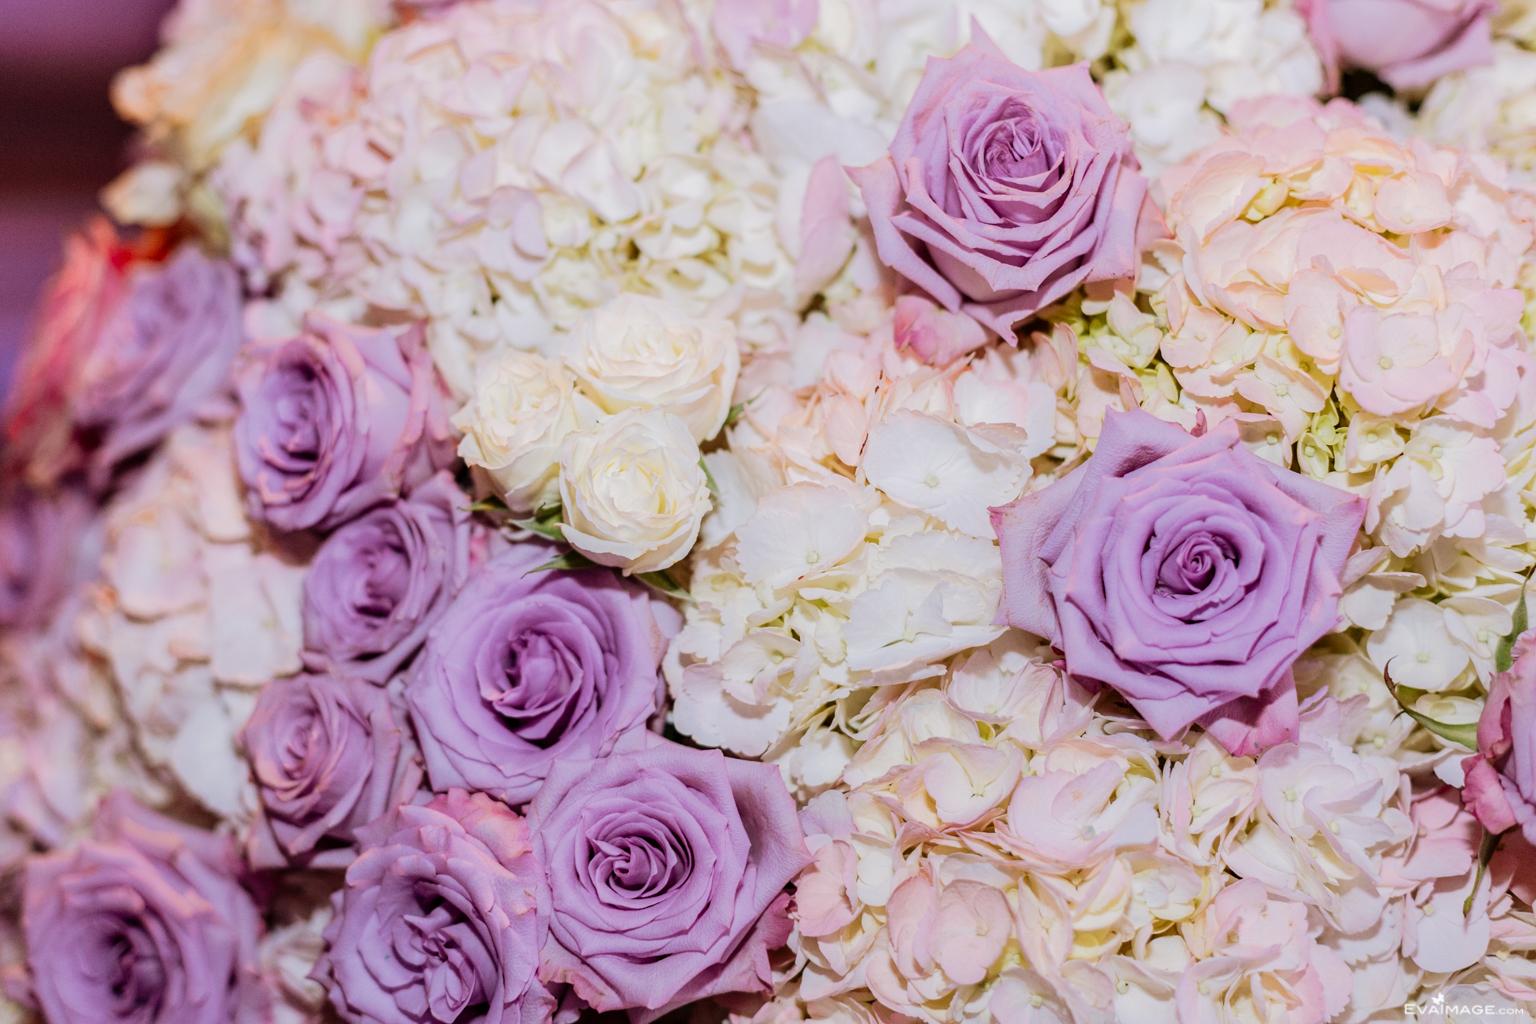 Purple White Roses White Hydrangeas Toronto Florist by EvaImage Photography.jpg